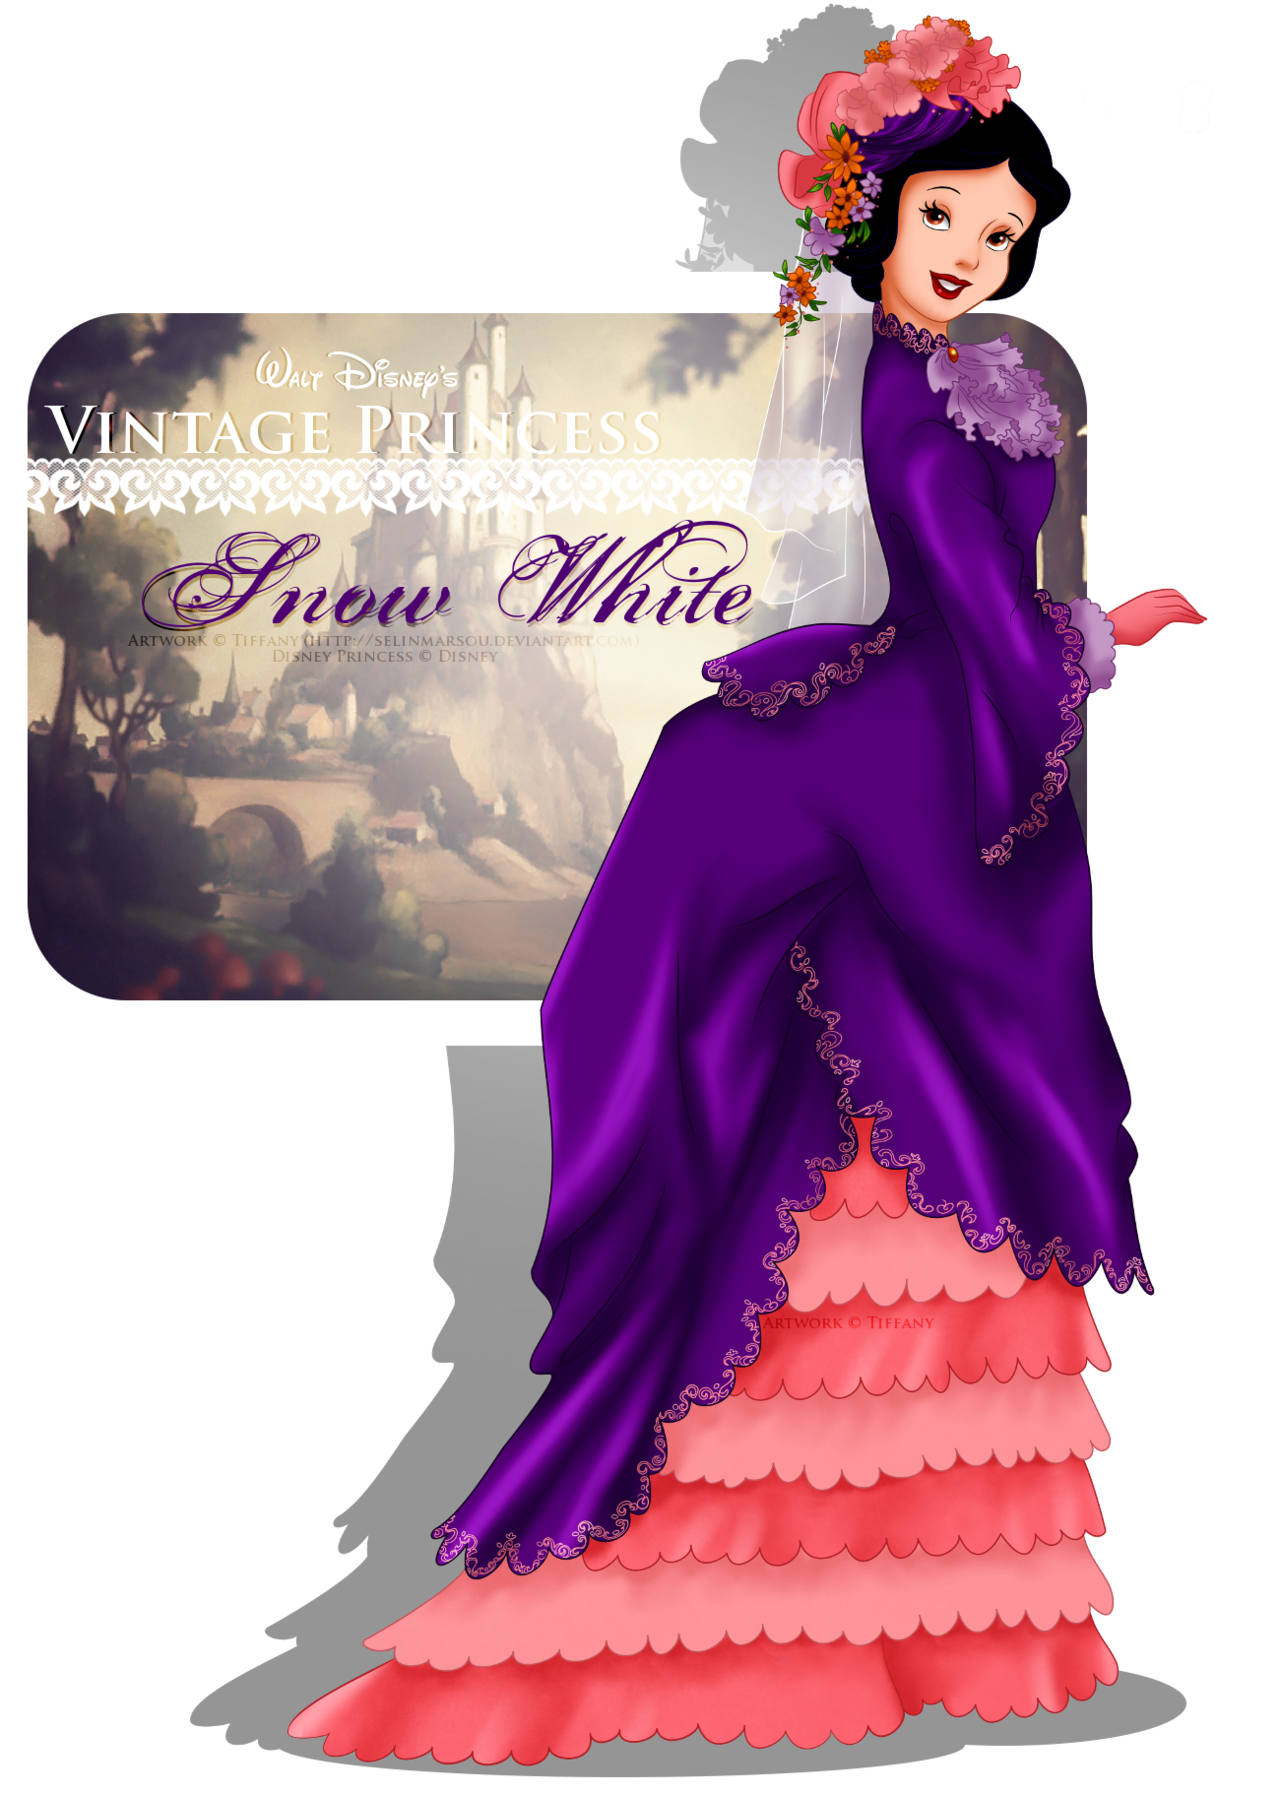 Vintage Princess -Snow White